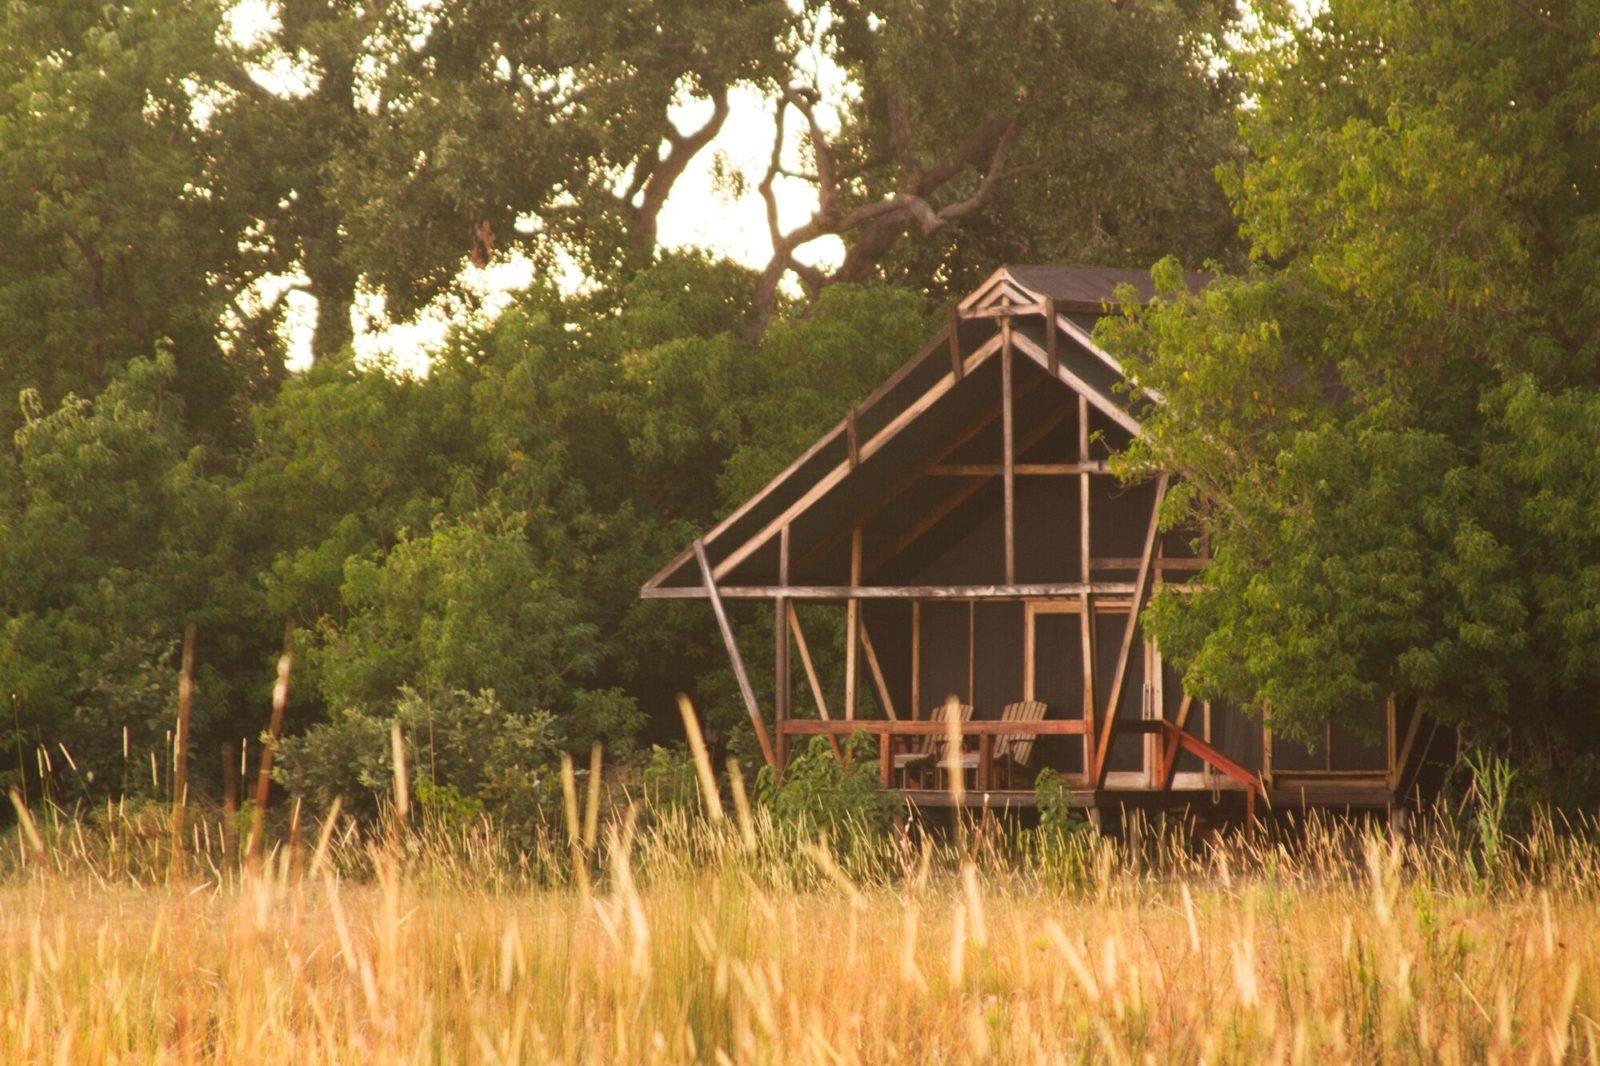 Guest tent exterior view at Lebala Camp